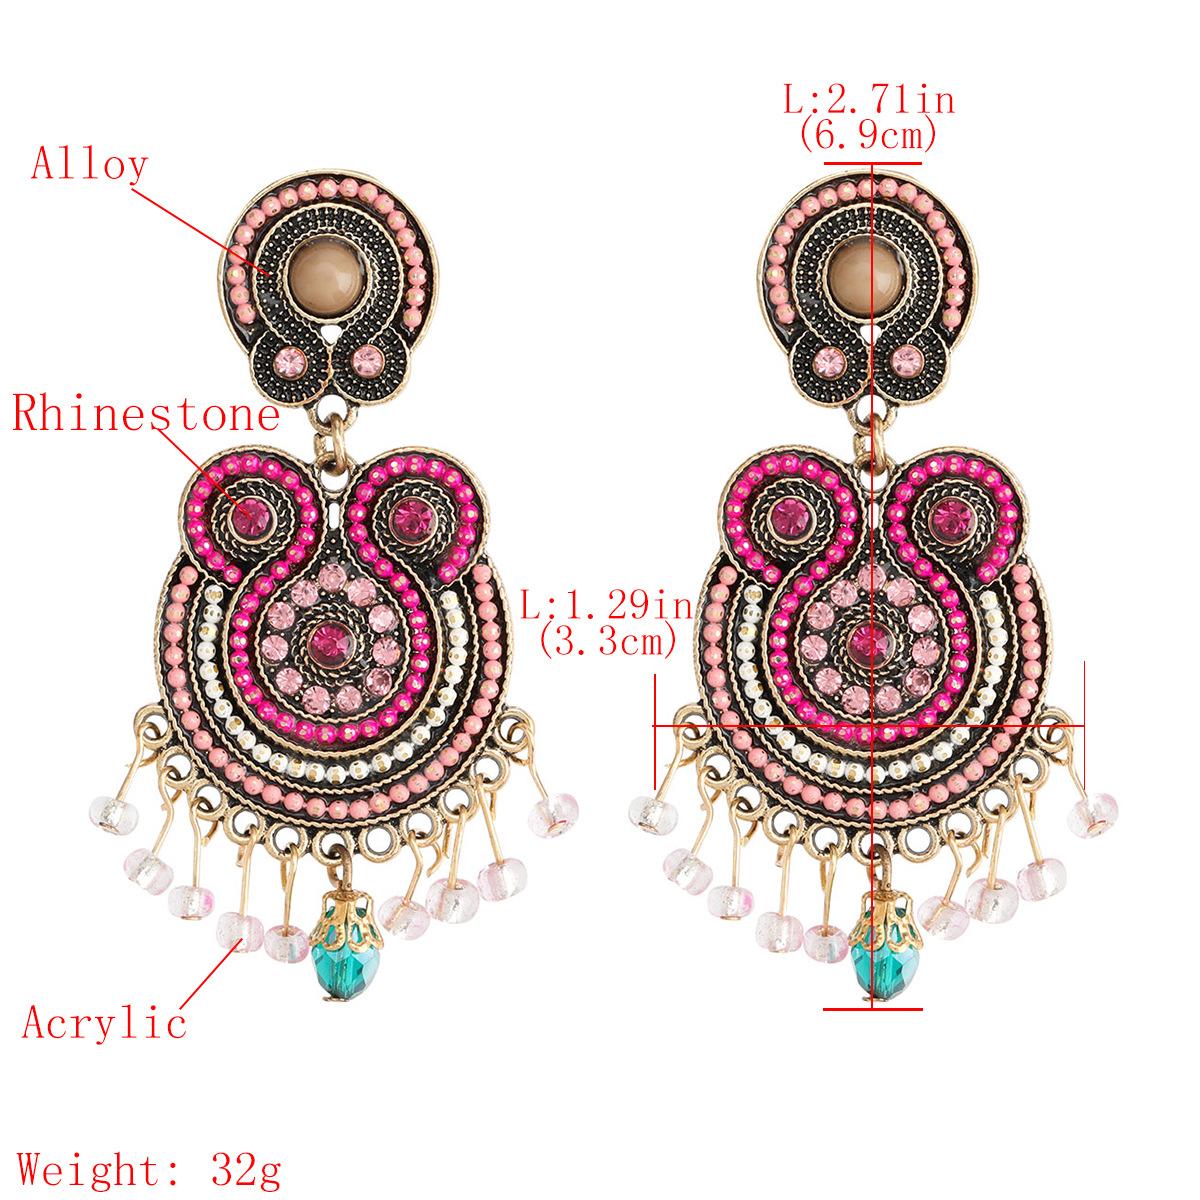 multilayer alloy diamondstudded acrylic tassel retro bohemian ethnic earrings wholesale nihaojewelry NHJE238812